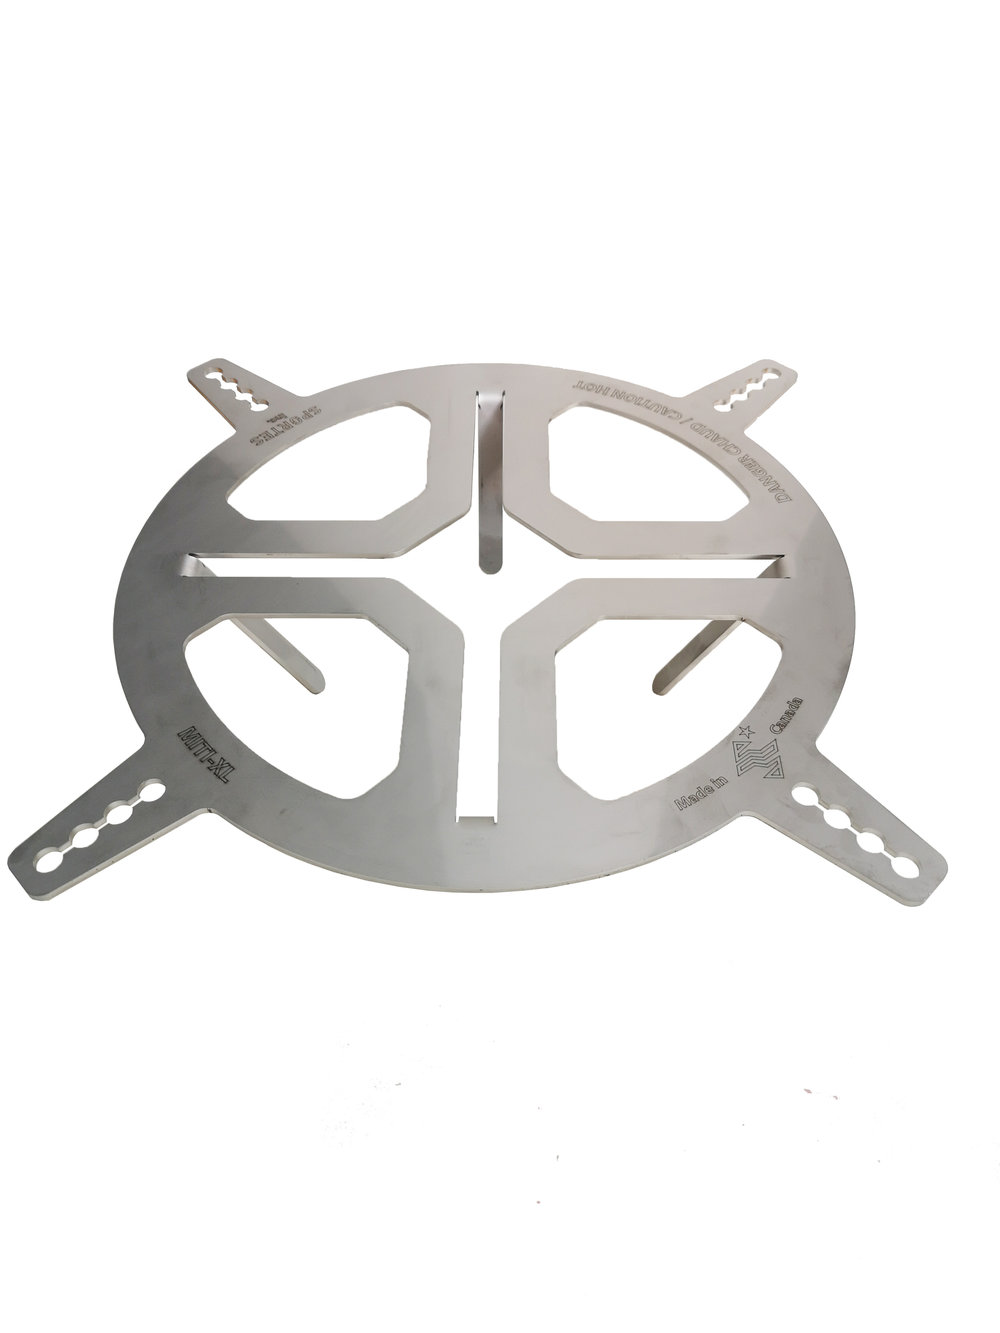 MITI_XL - 85,50 CAD | X large ''Swedish Torch'' cooking tool